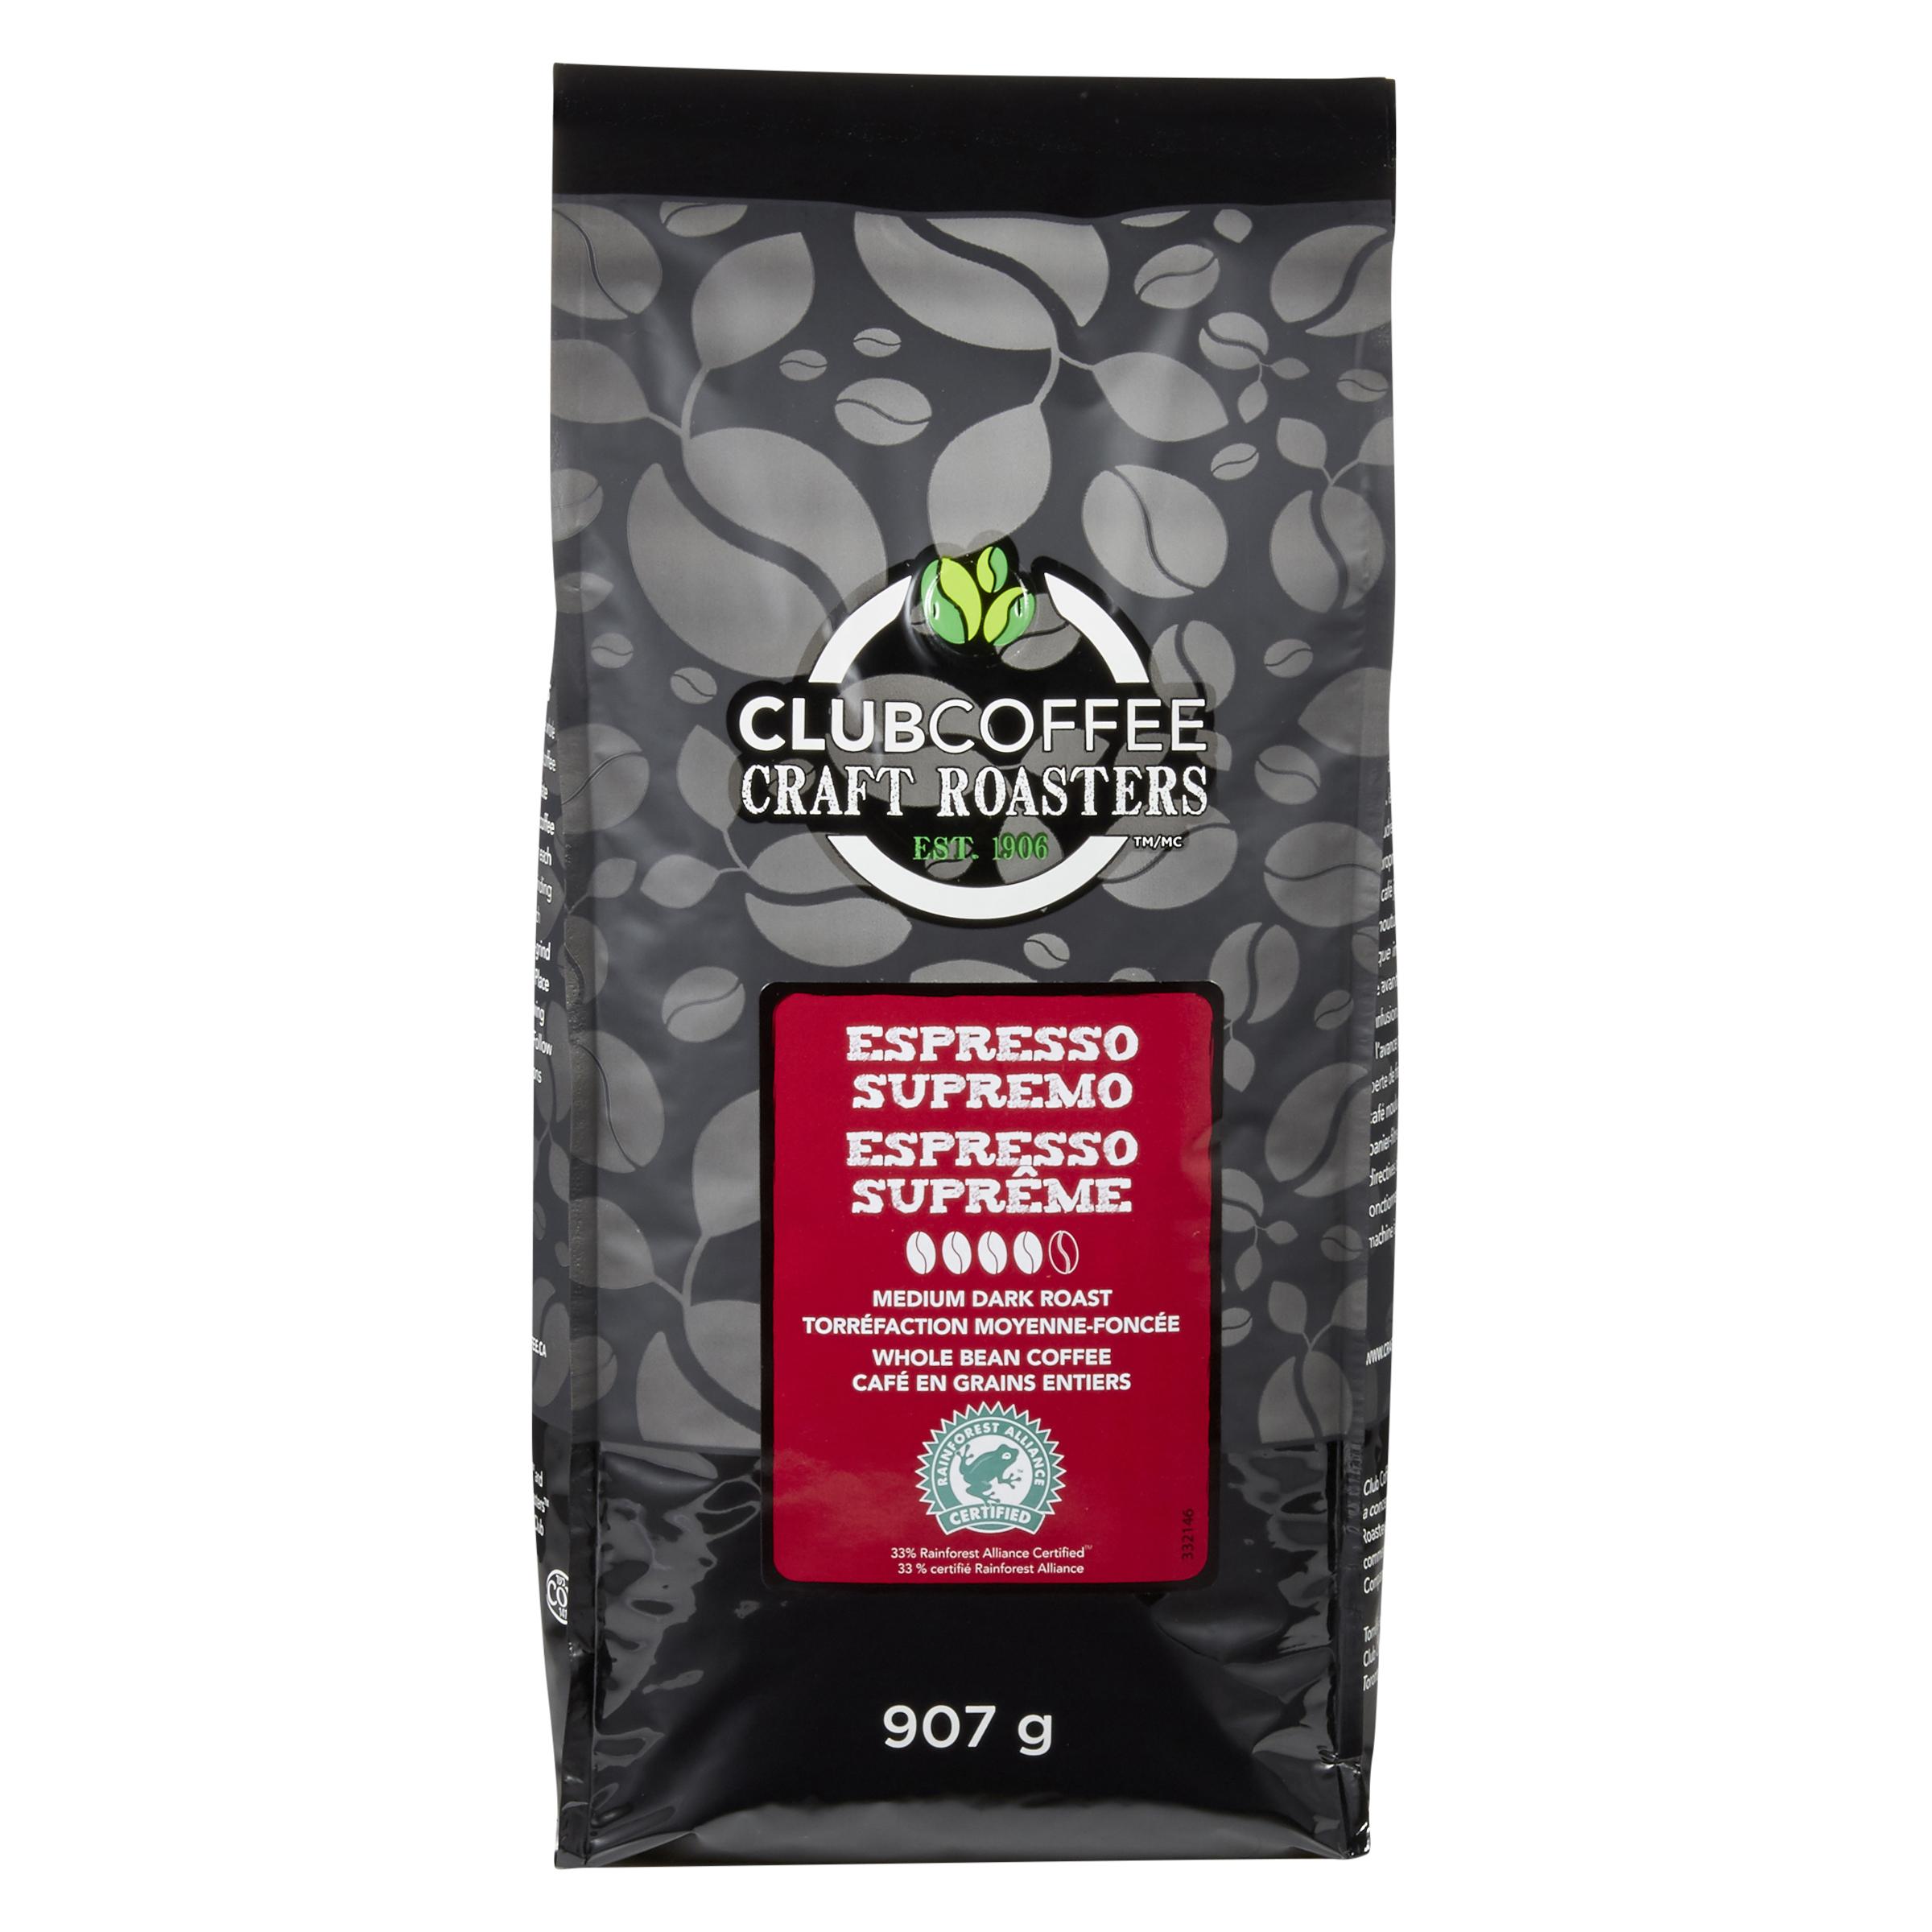 Craft Roasters Whole Bean Espresso Supremo Blend Medium Dark Roast